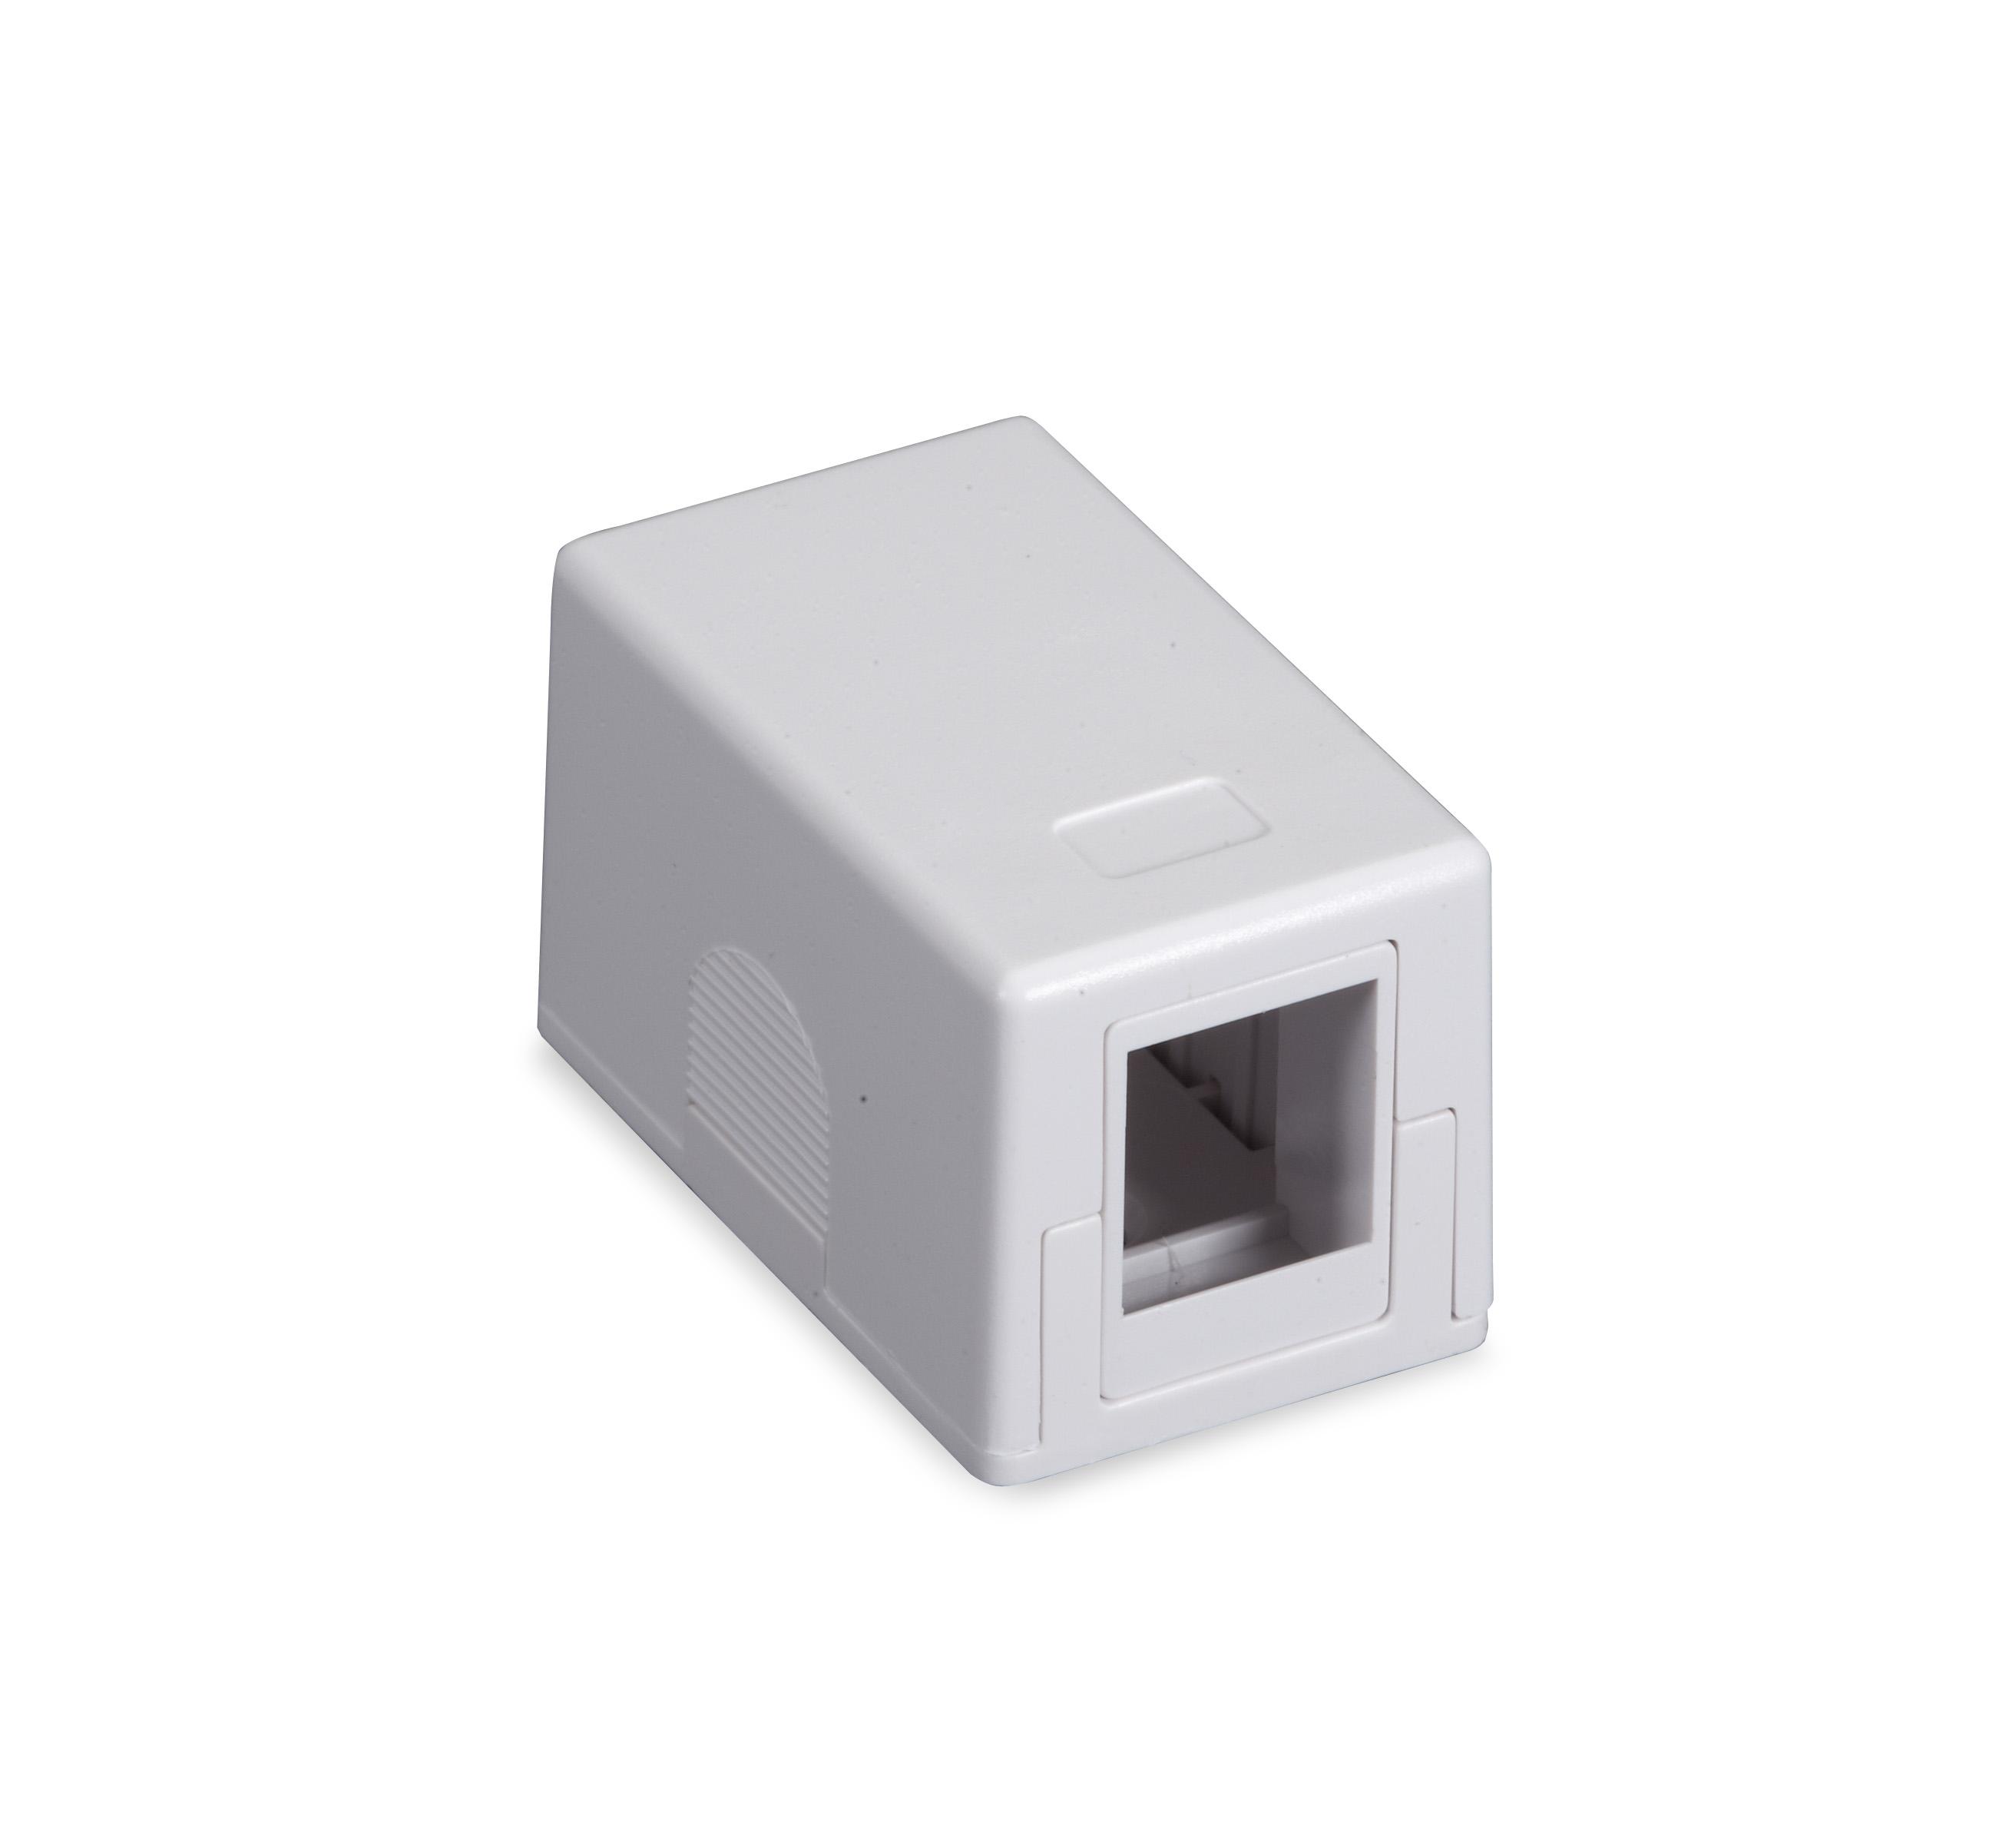 Black Box Connect RJ-45 Surface-Mount Housing - White, 1-Port